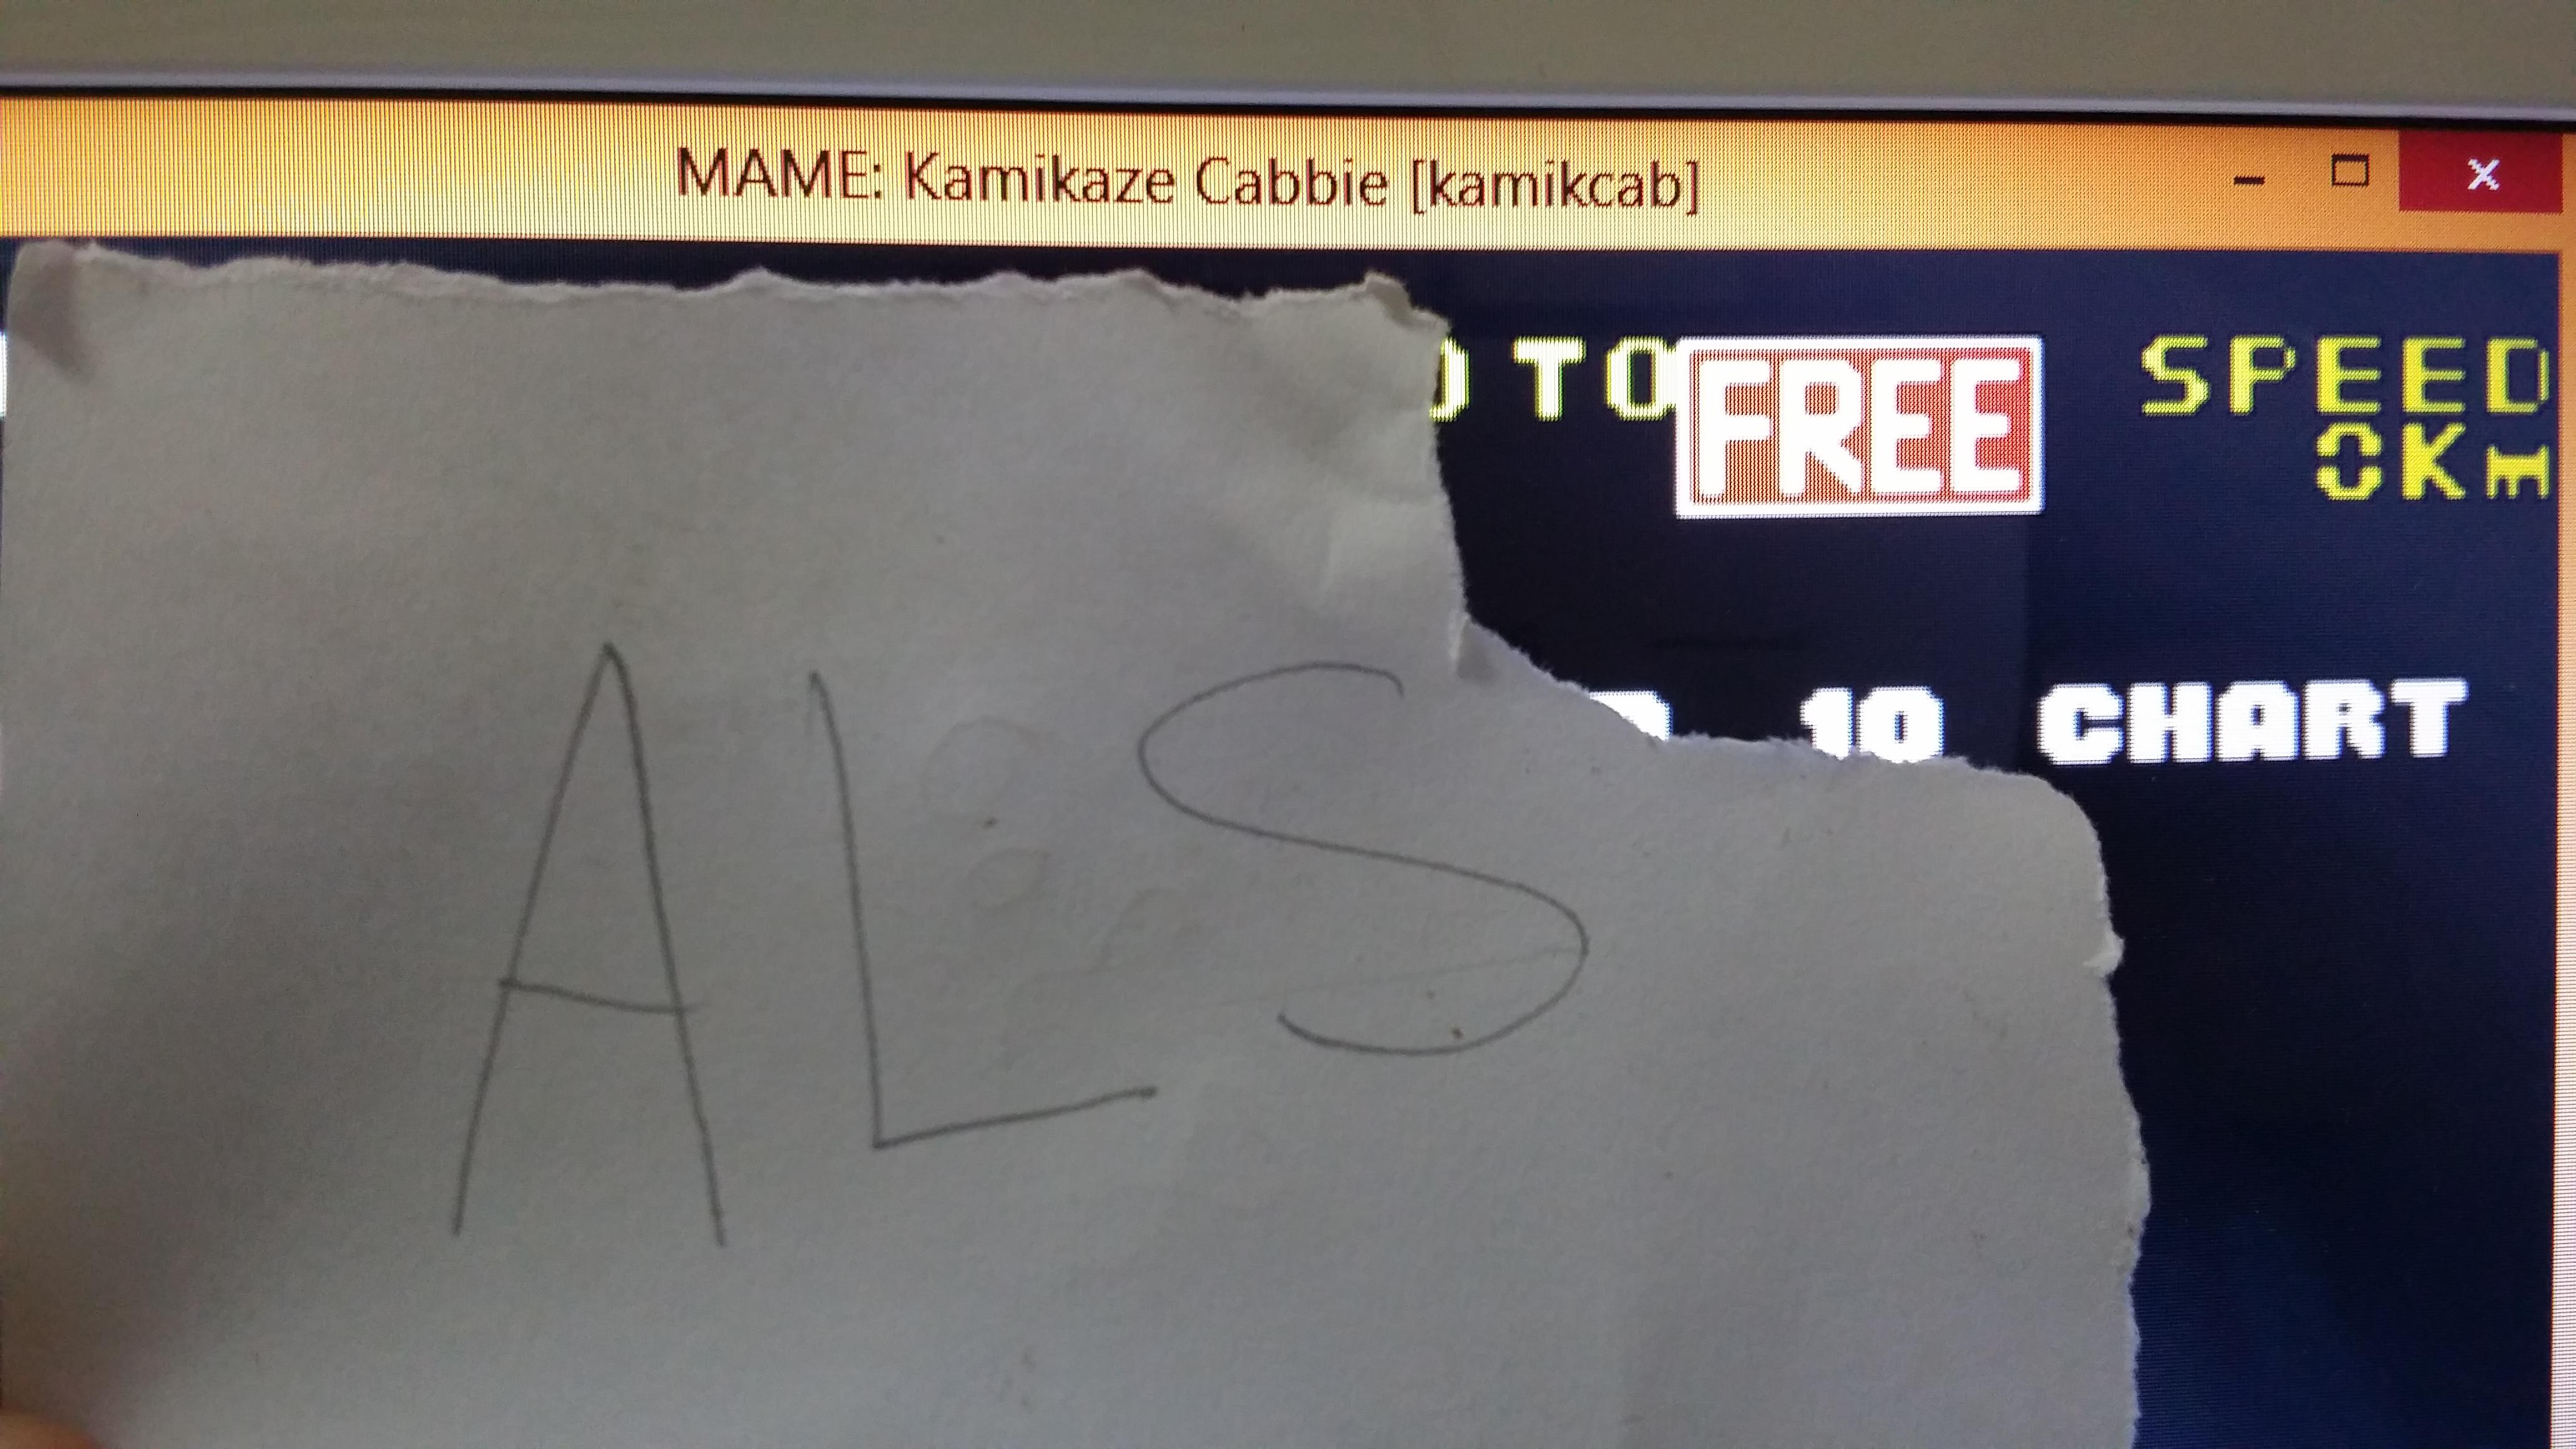 muscleandfitness: Kamikaze Cabbie (Arcade Emulated / M.A.M.E.) 10,400 points on 2014-06-13 06:04:50